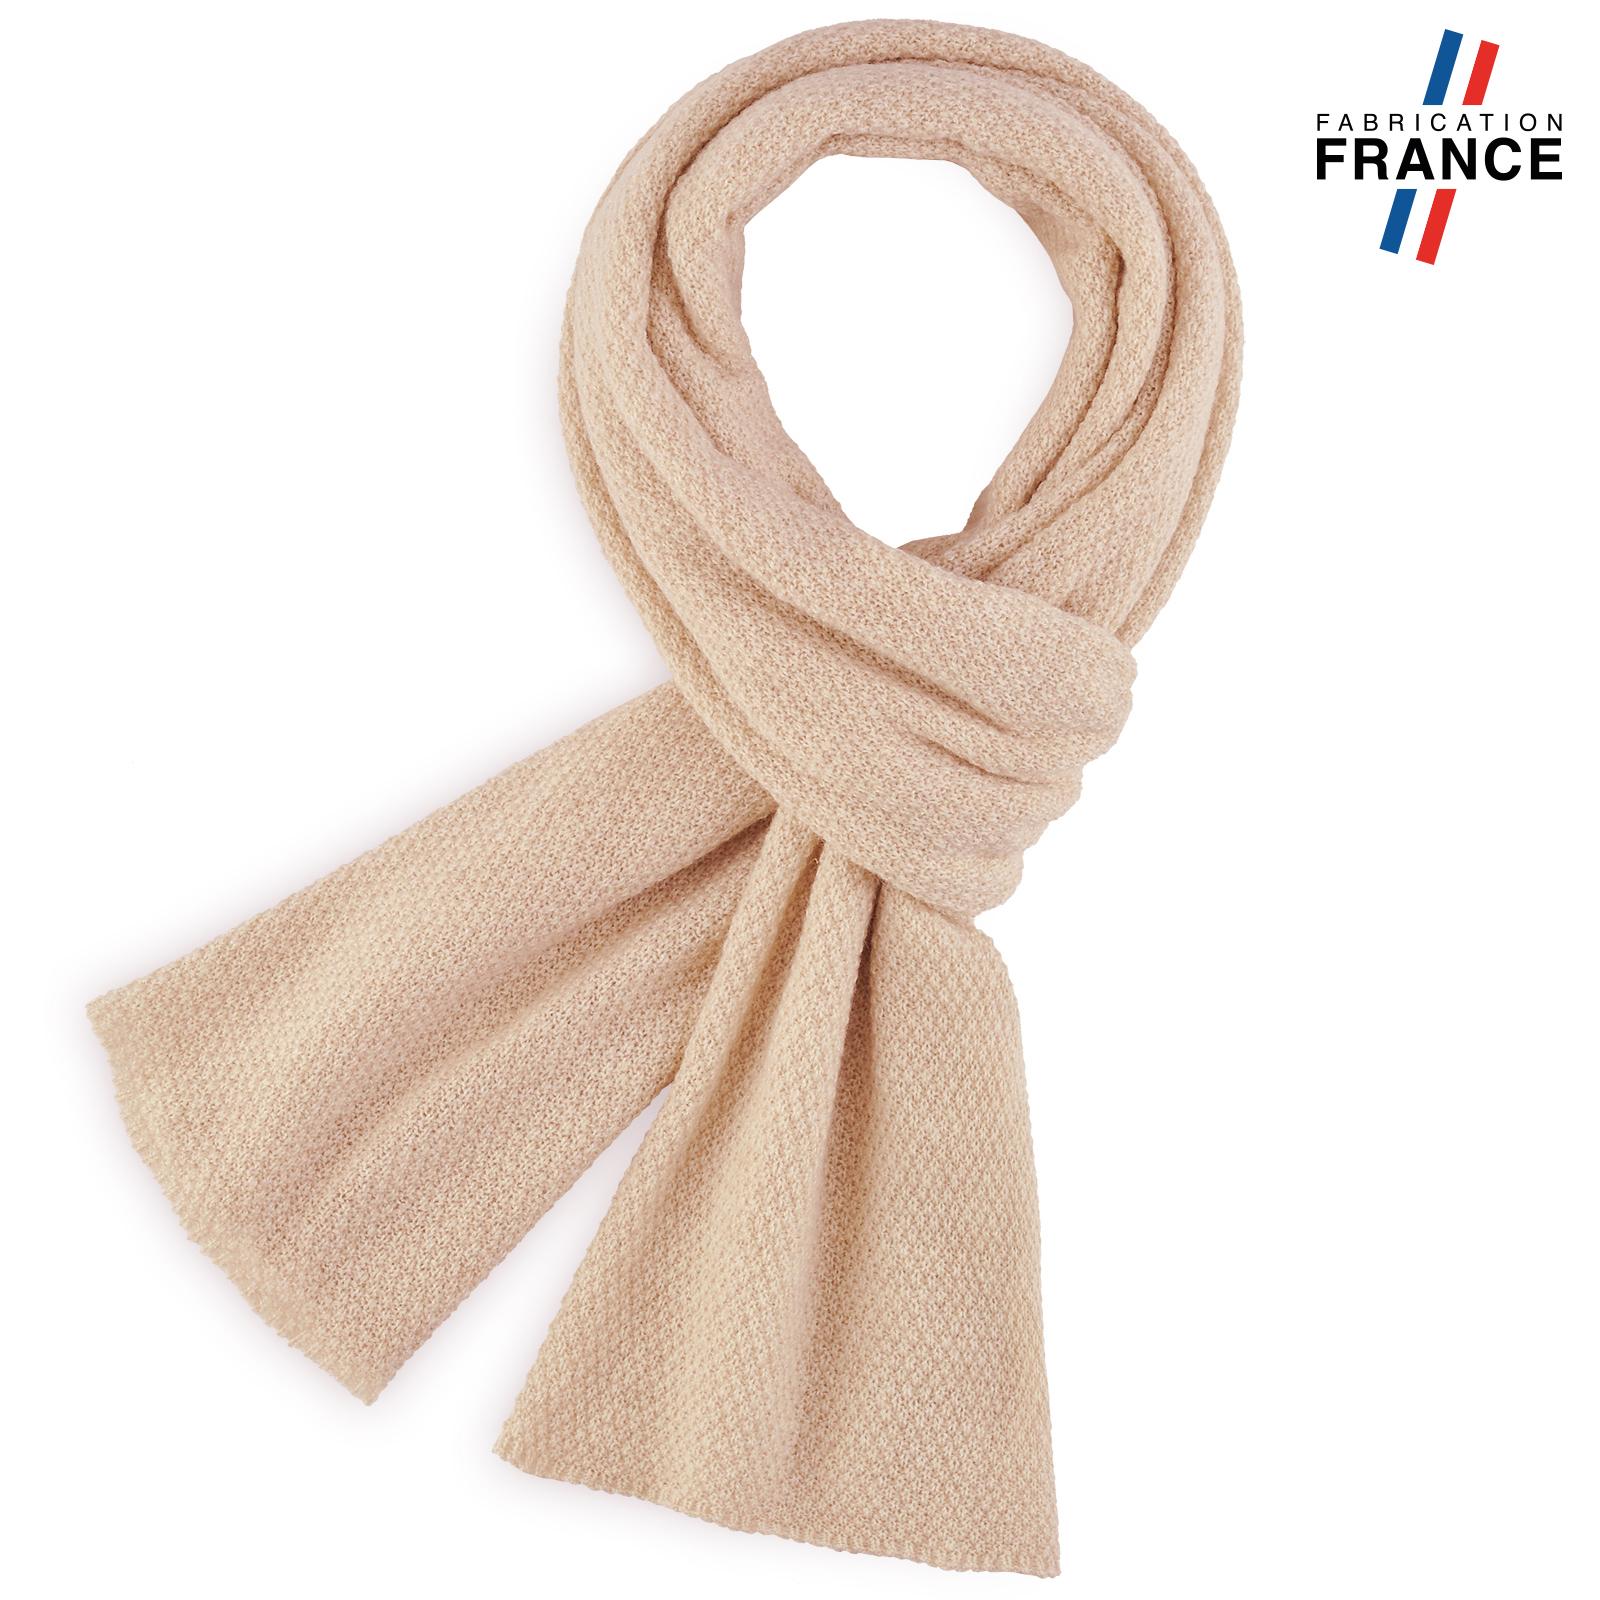 AT-03187-F16-echarpe-laine-cachemire-beige-uni-fabrication-francaise